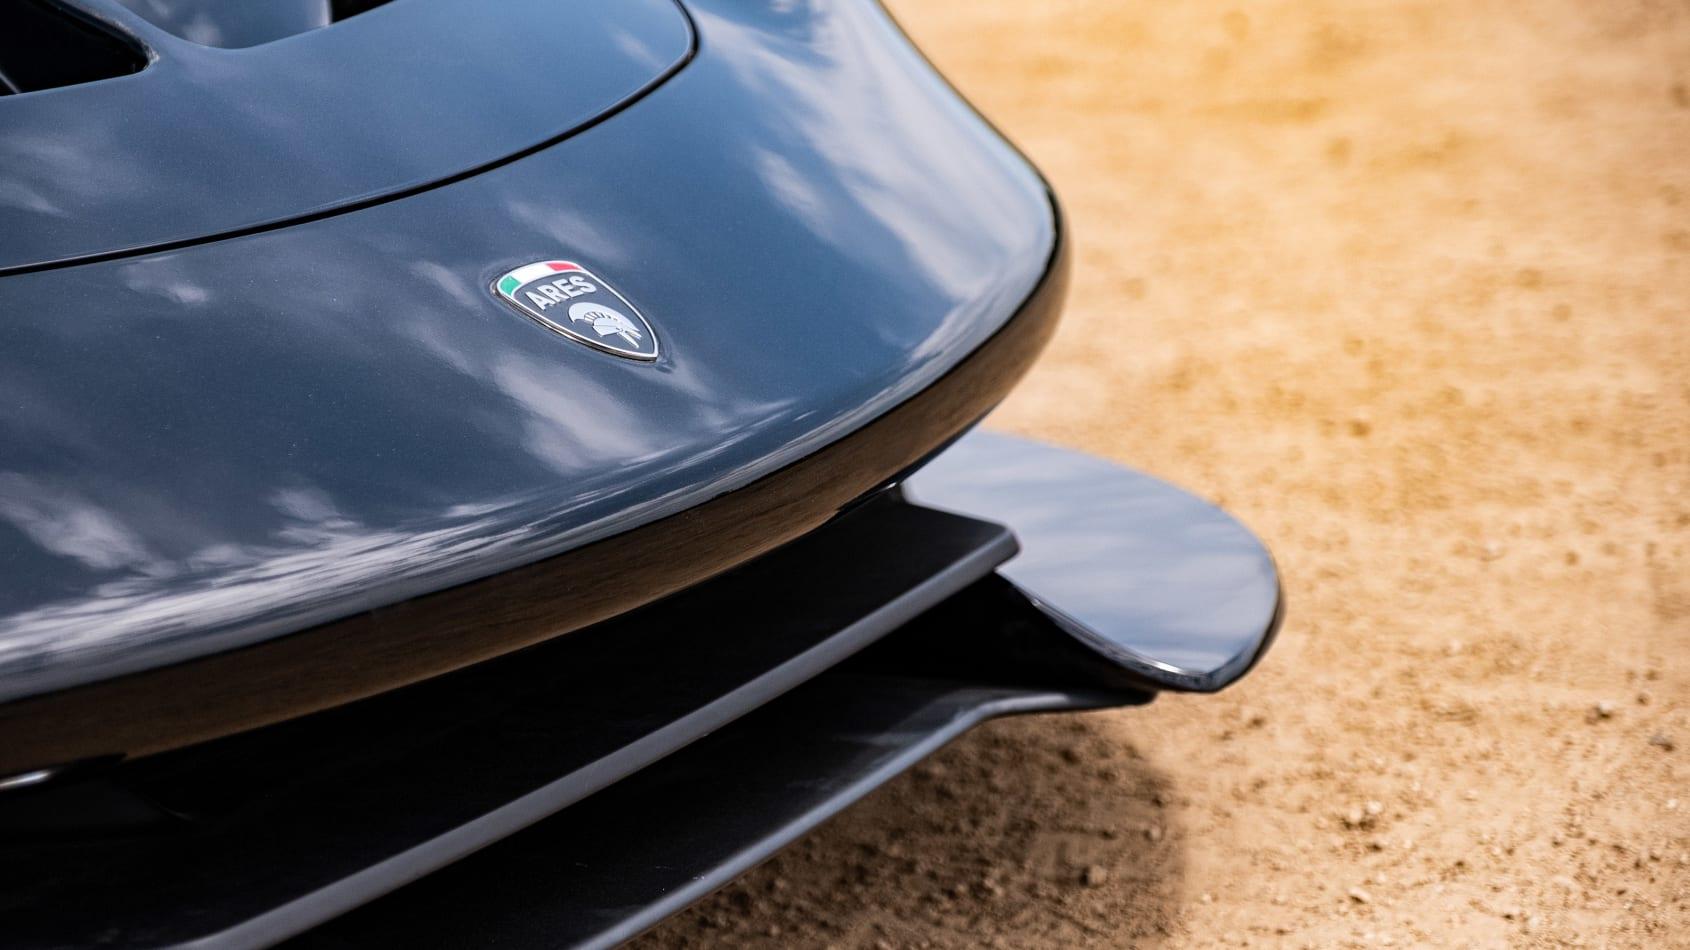 Ares Design rivela la sua Supercar Progetto S1 con ben 705cv